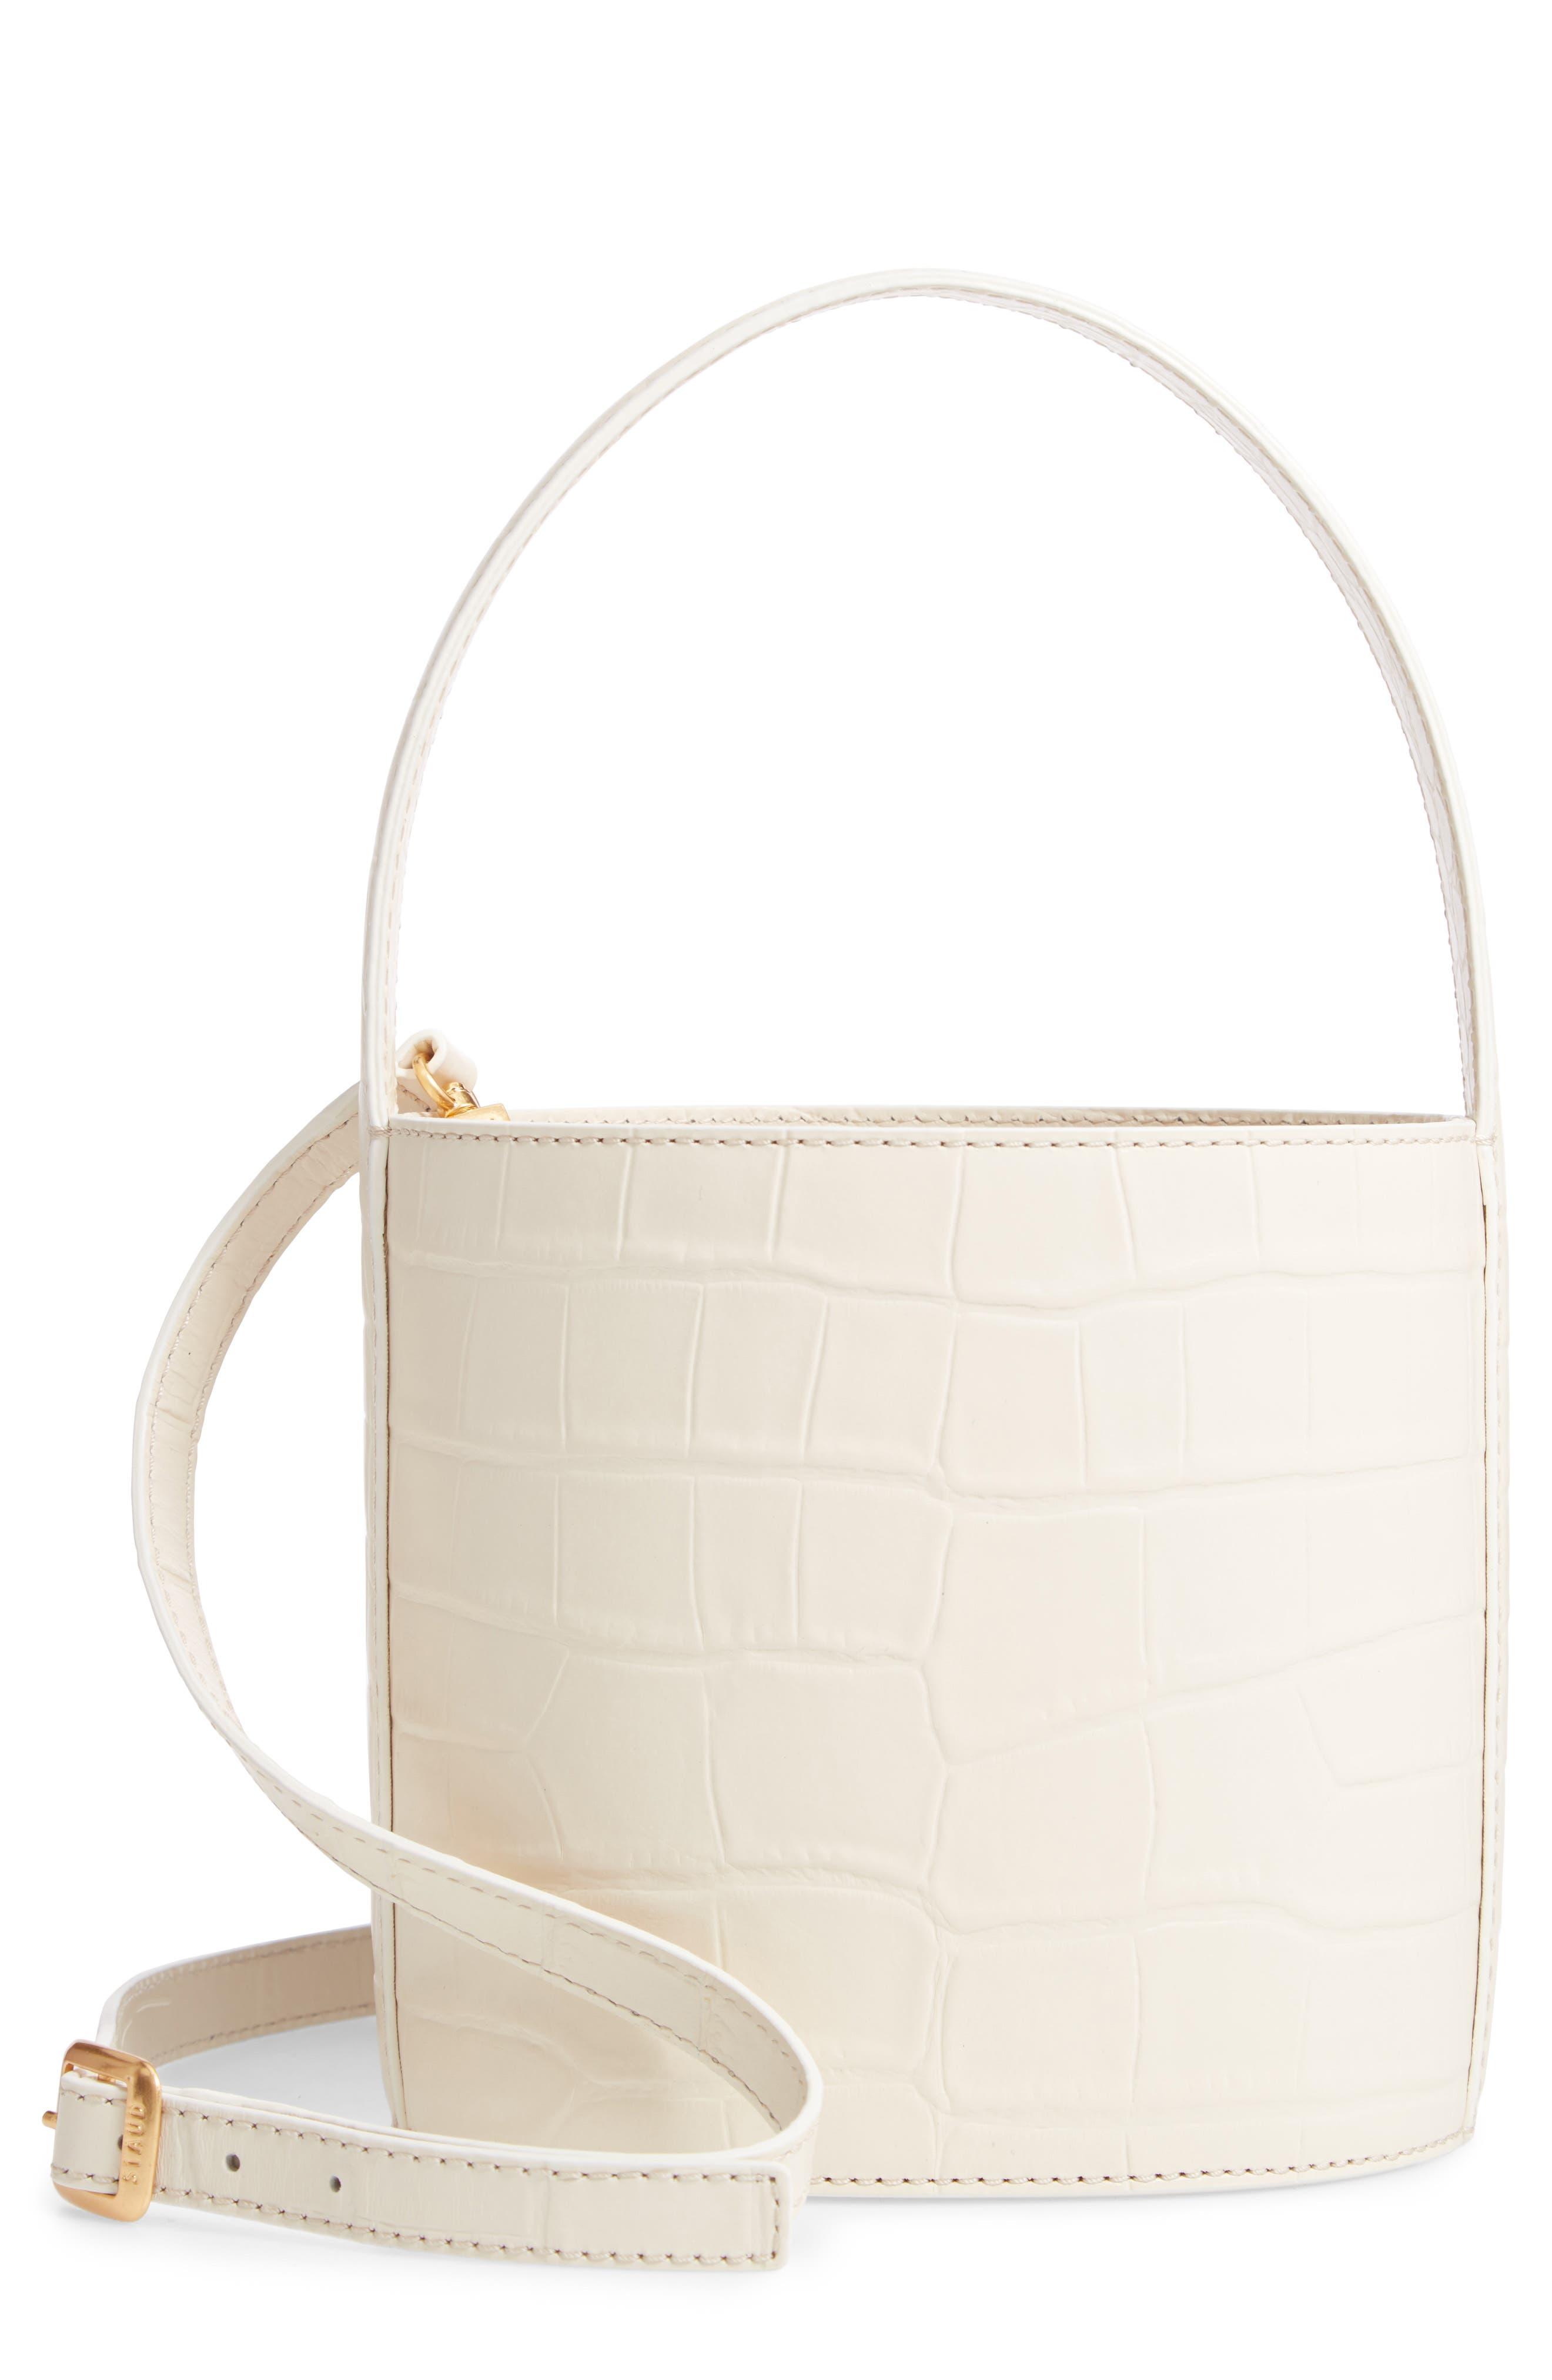 Bissett Croc Embossed Leather Bucket Bag - Ivory in Cream